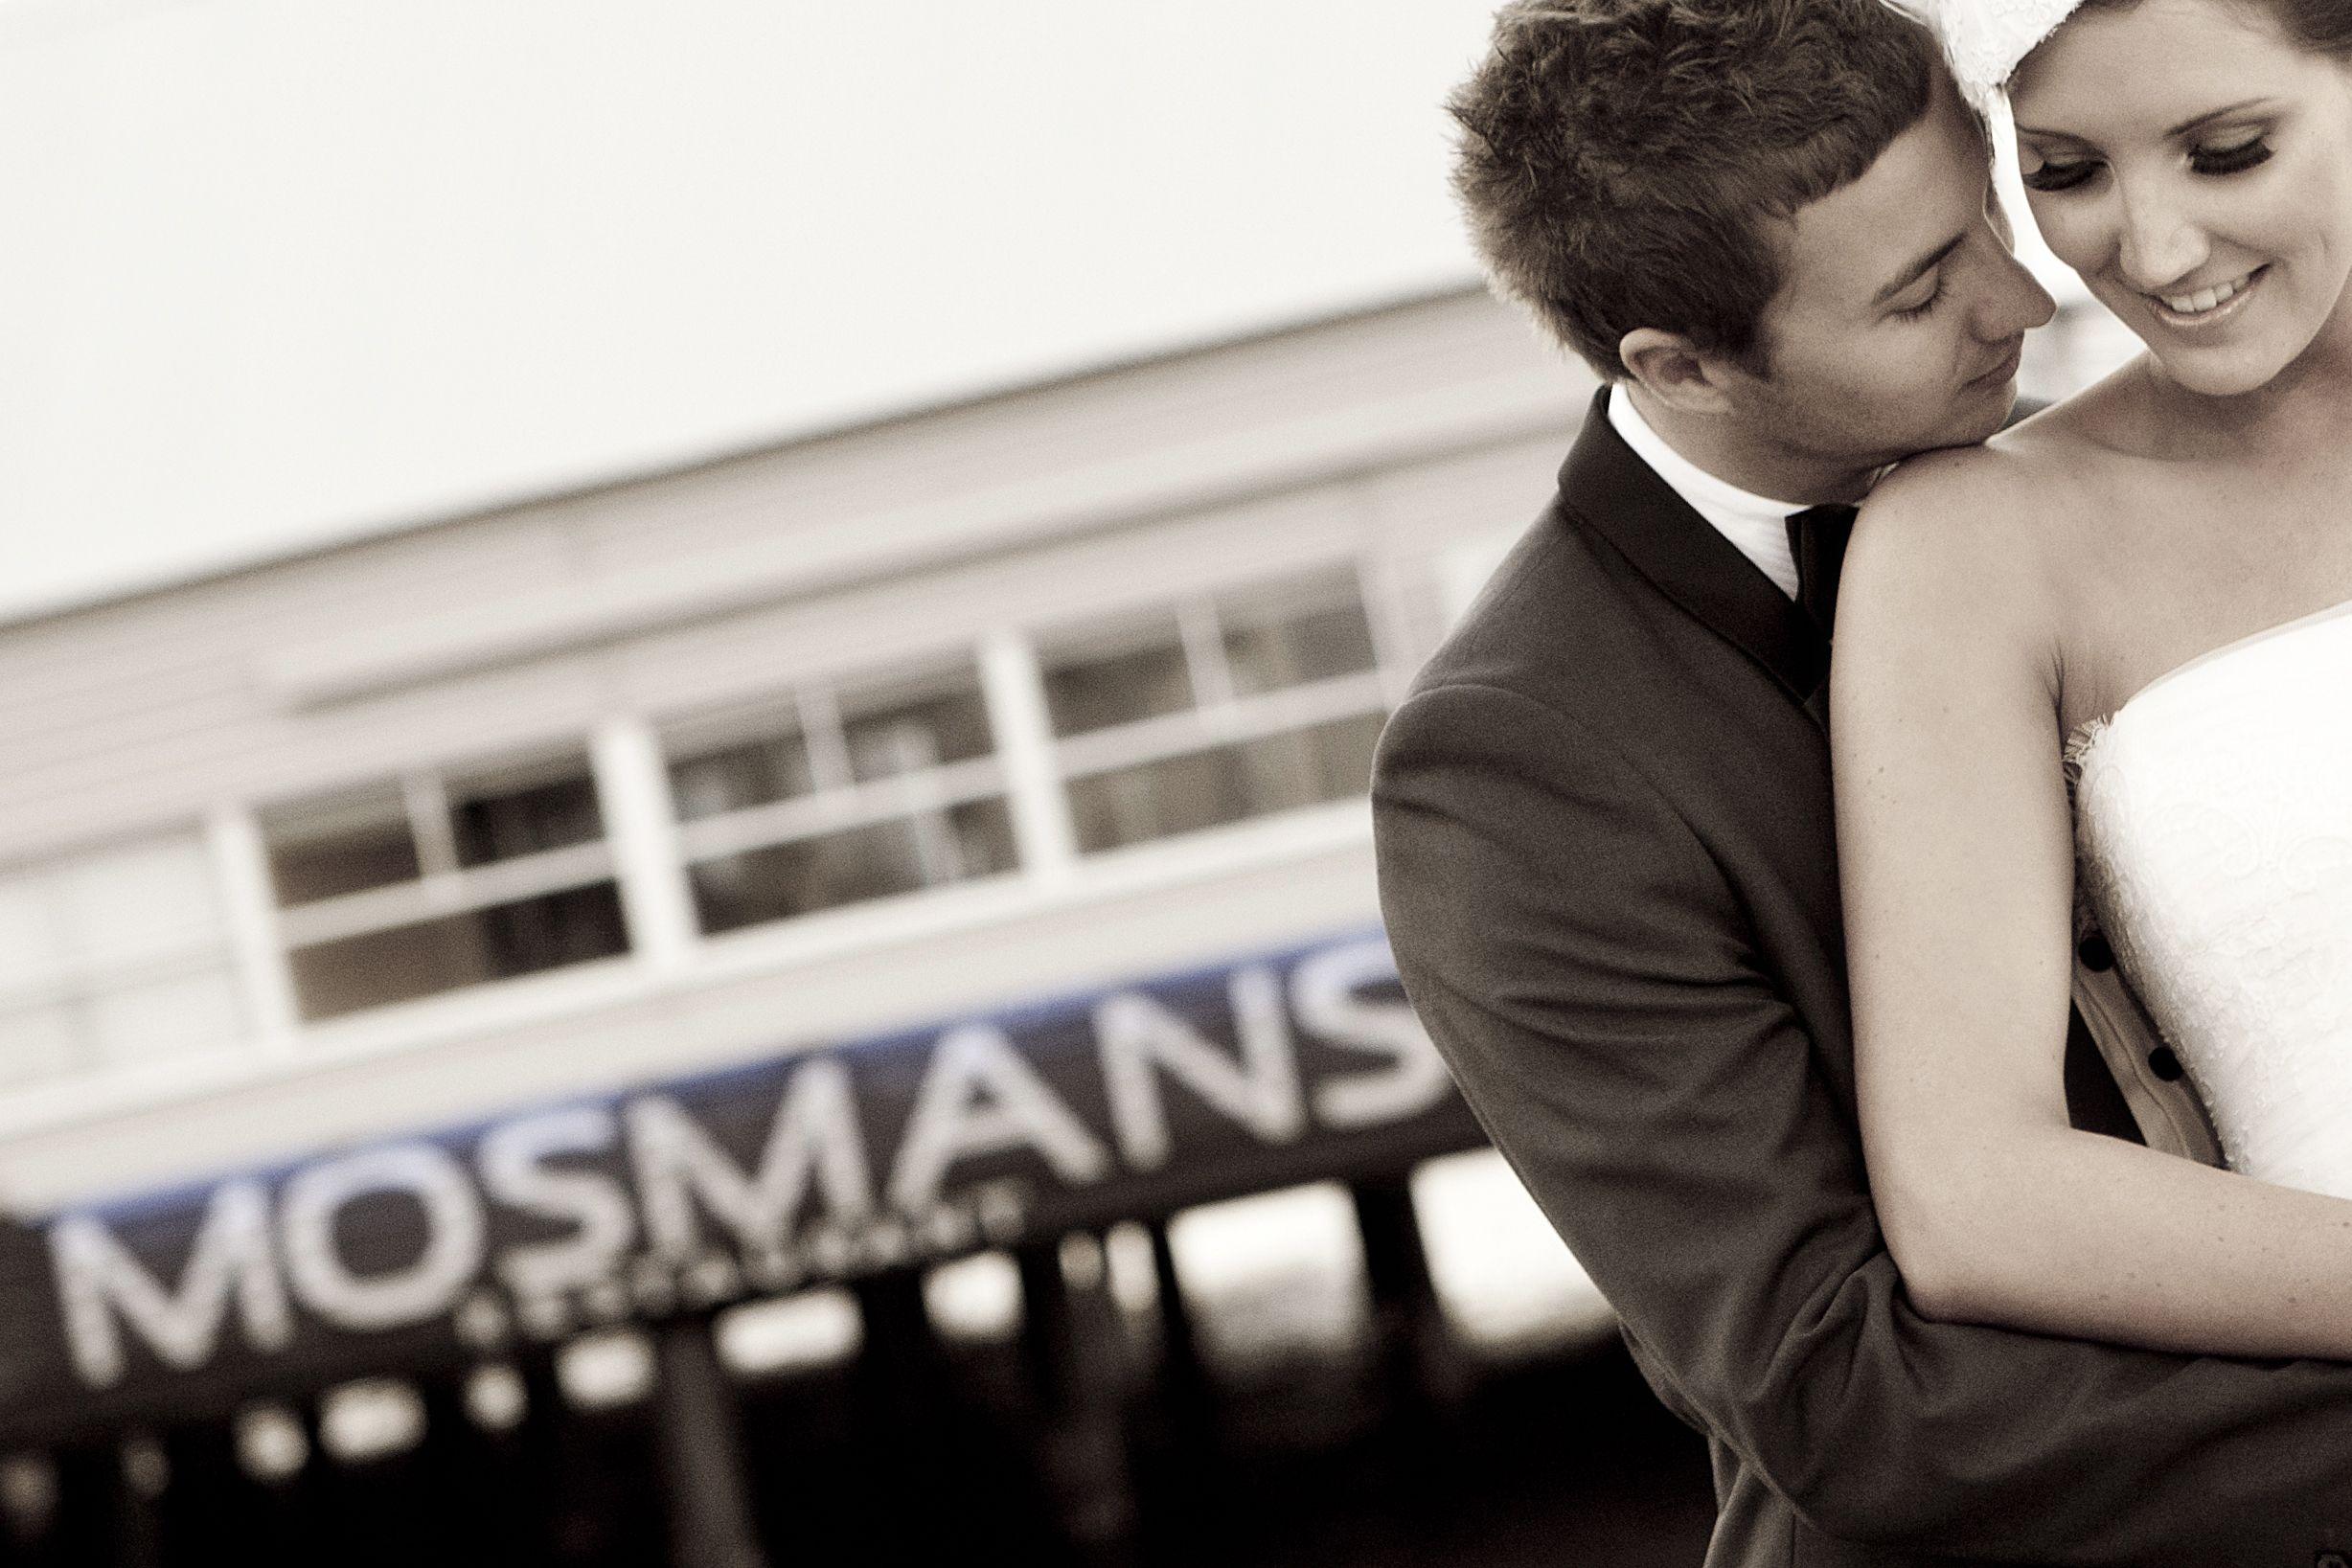 Wedding reception venue Mosmans Restaurant on the